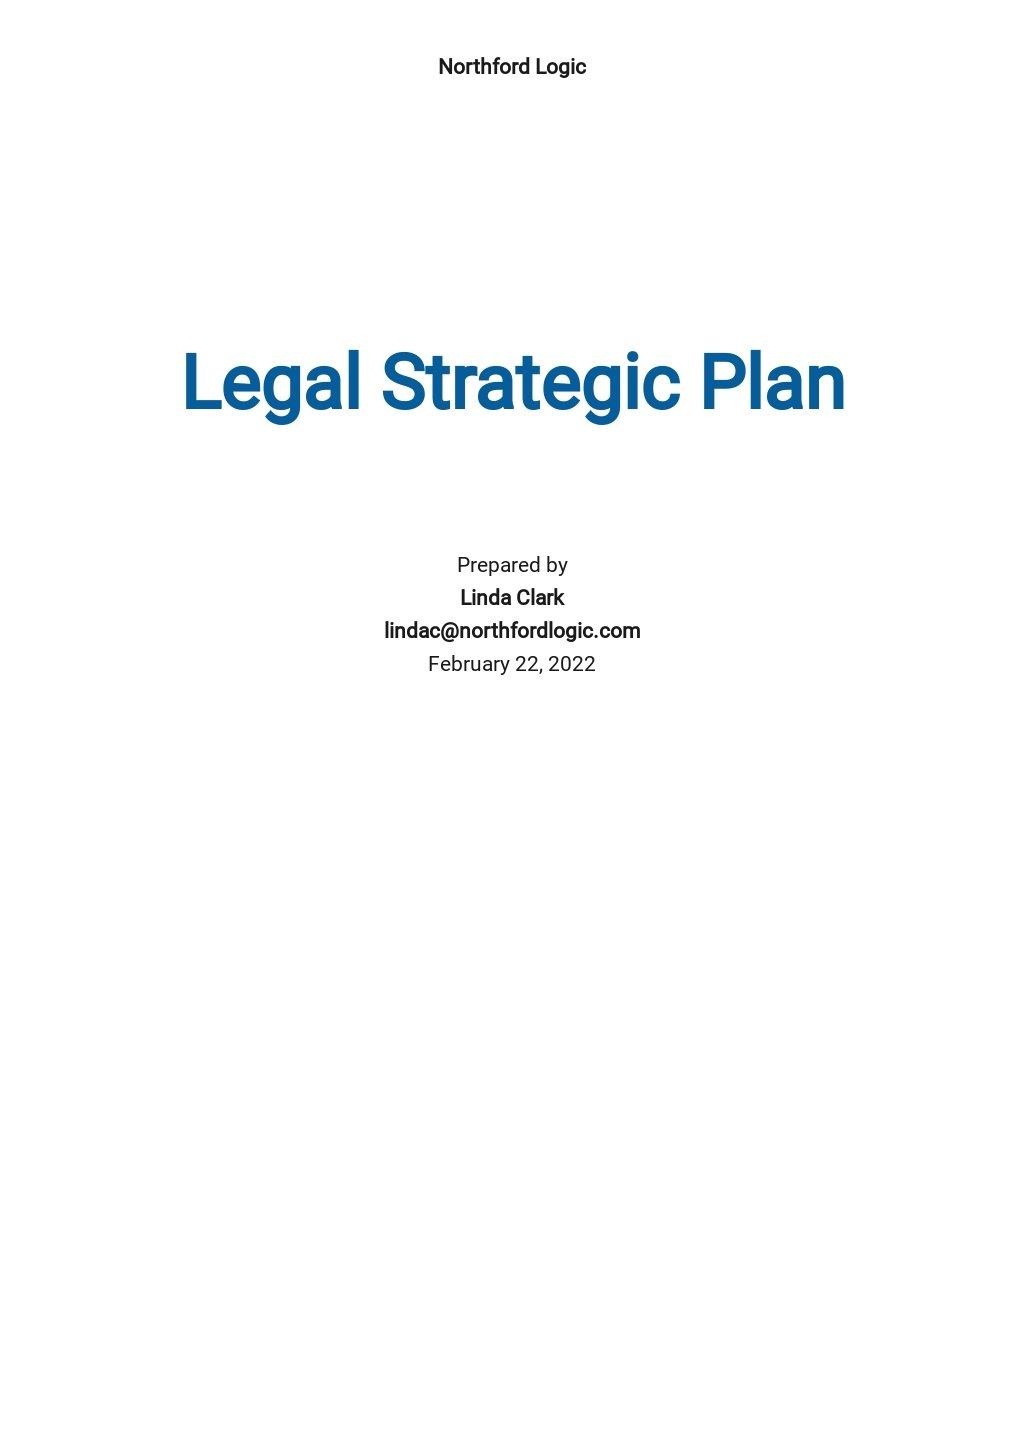 Legal Strategic Plan Template